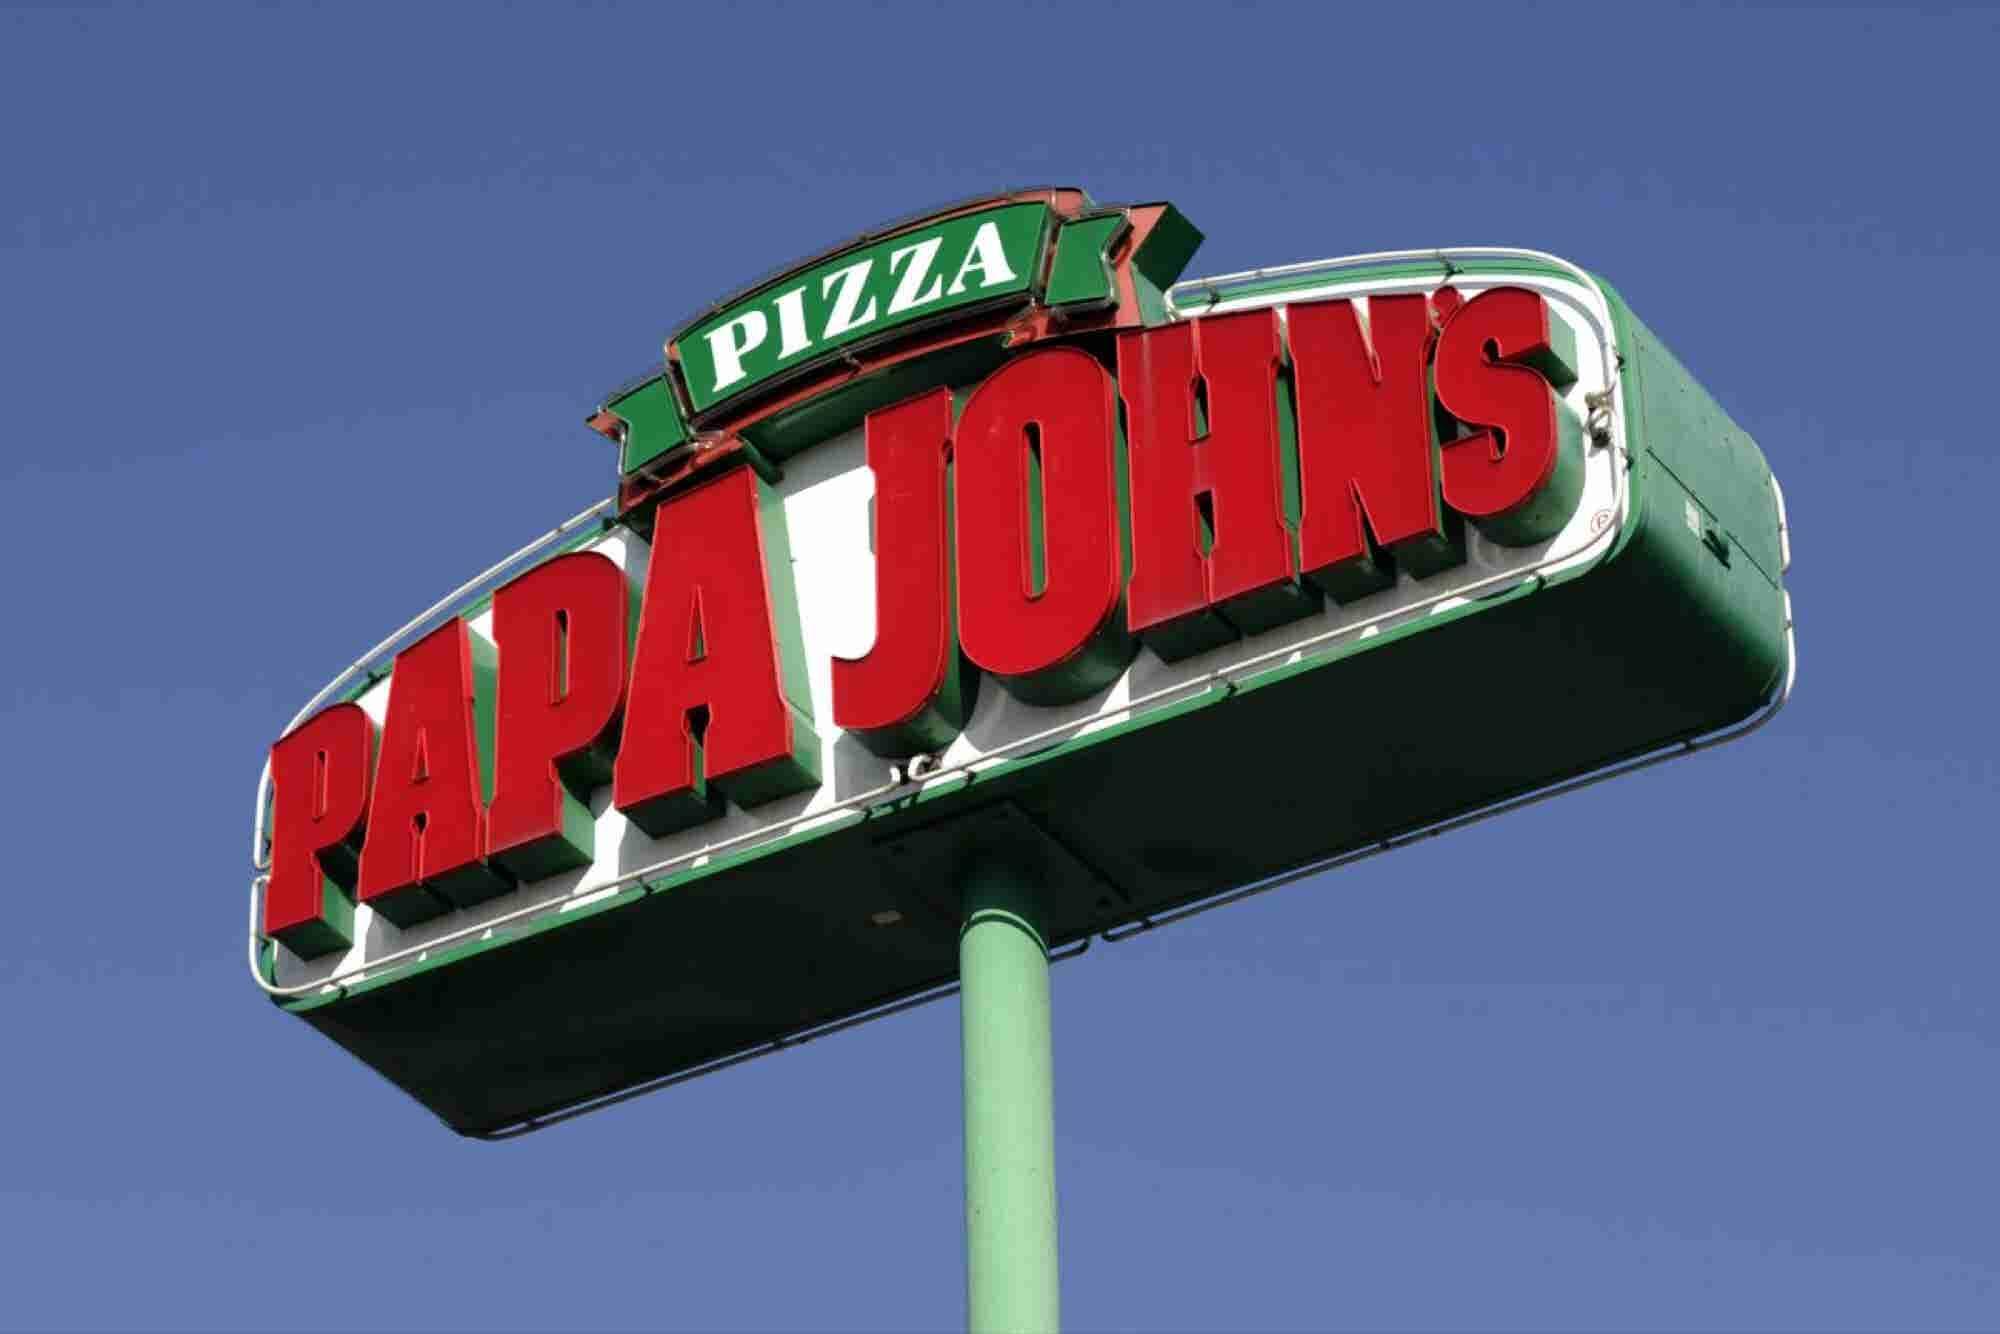 Better Marketing, Better Sales: 5 Marketing Don'ts From Papa John's